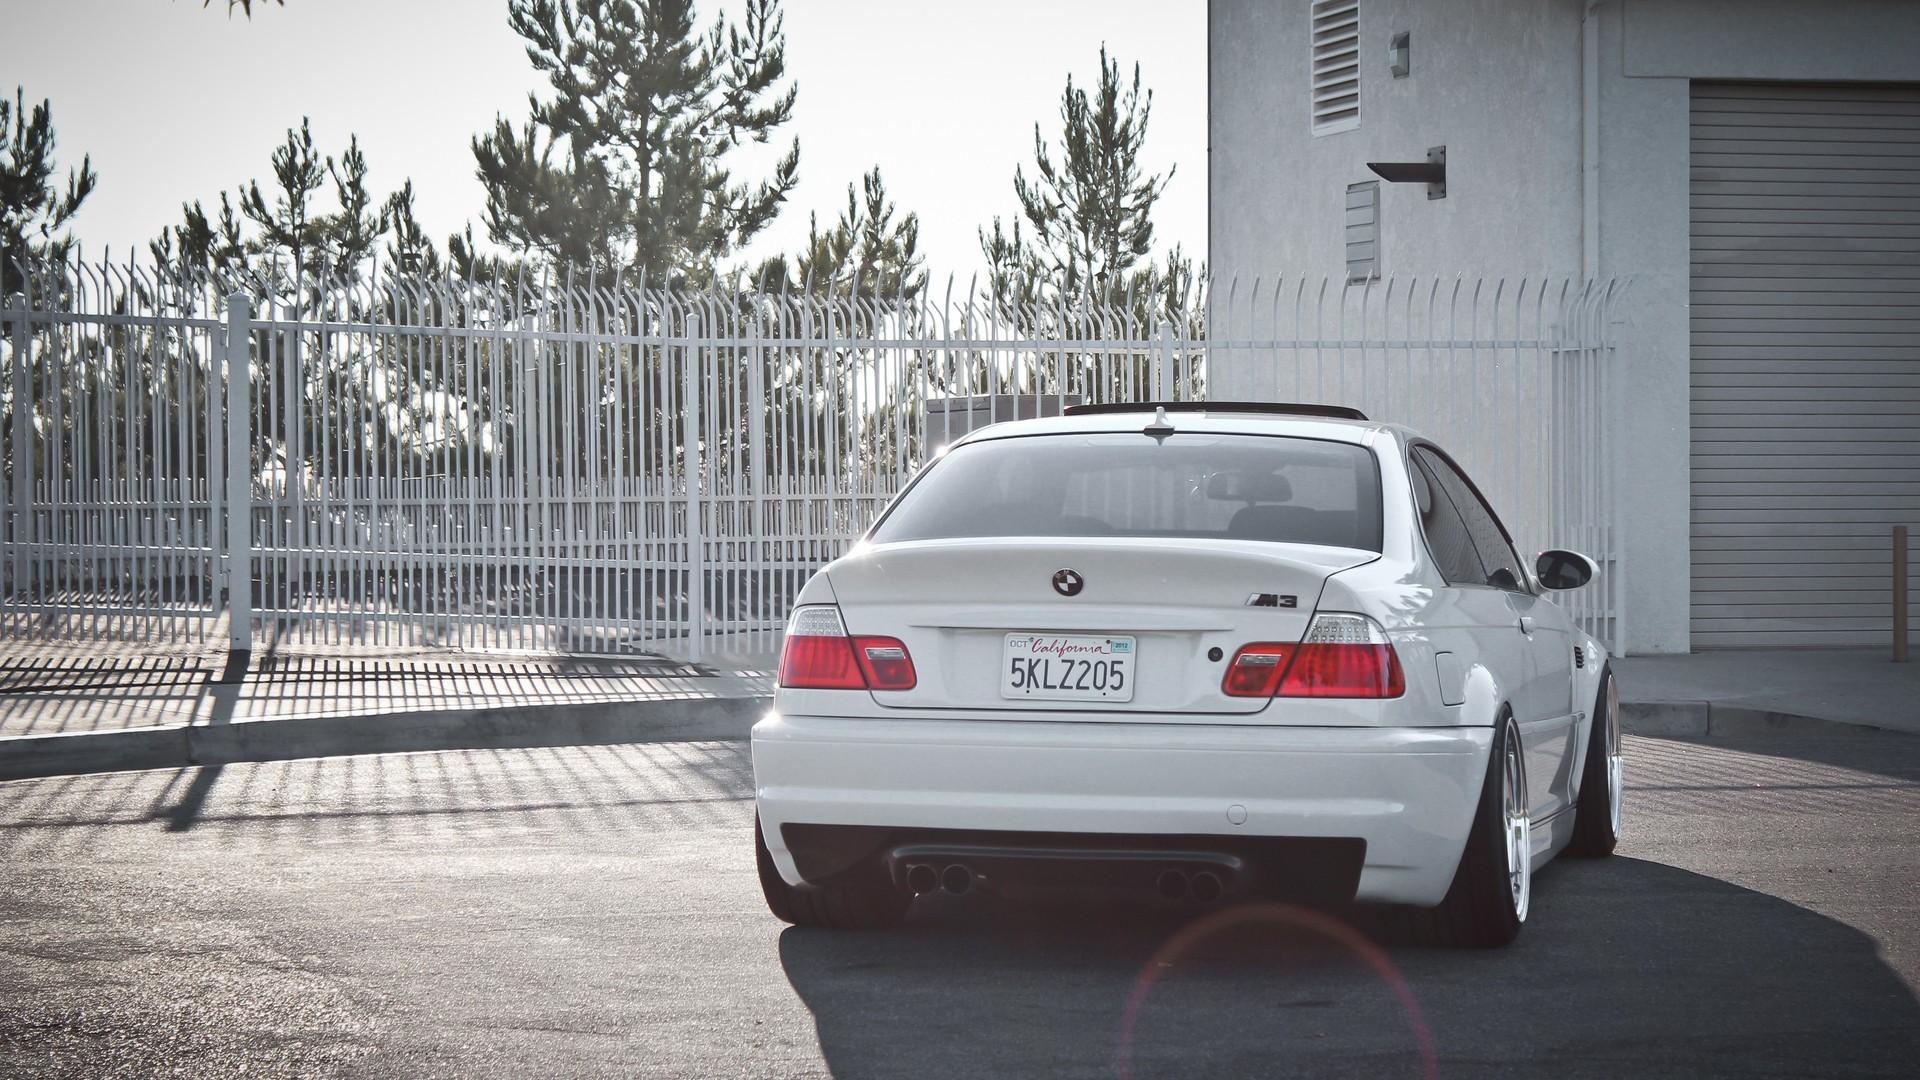 1920x1080 BMW M3 E46 Front Crystal City Car 2014